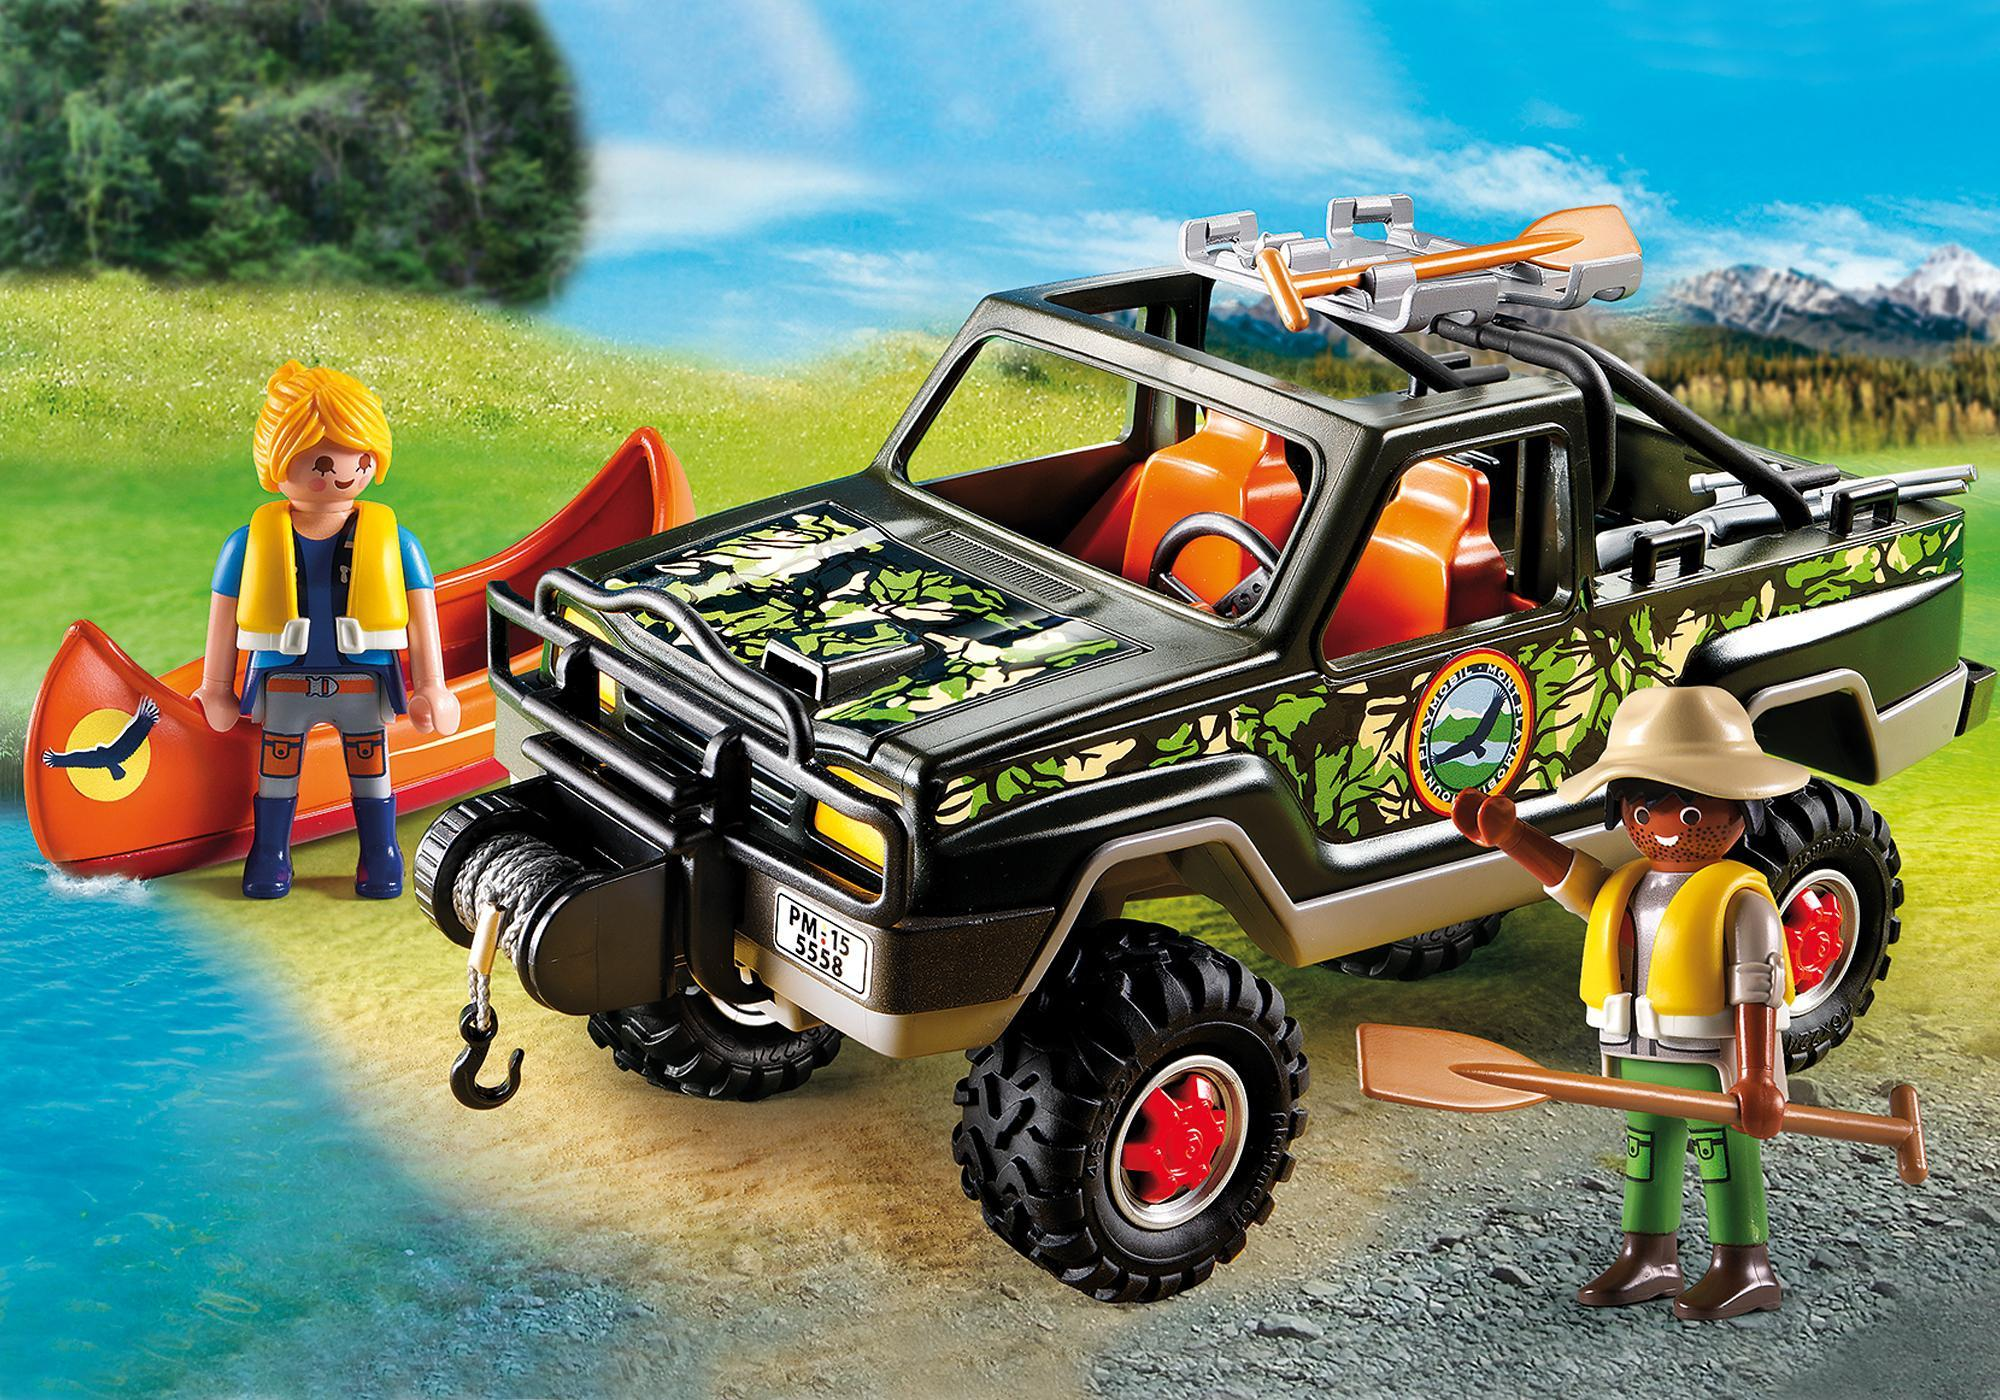 http://media.playmobil.com/i/playmobil/5558_product_detail/Abenteuer-Pickup